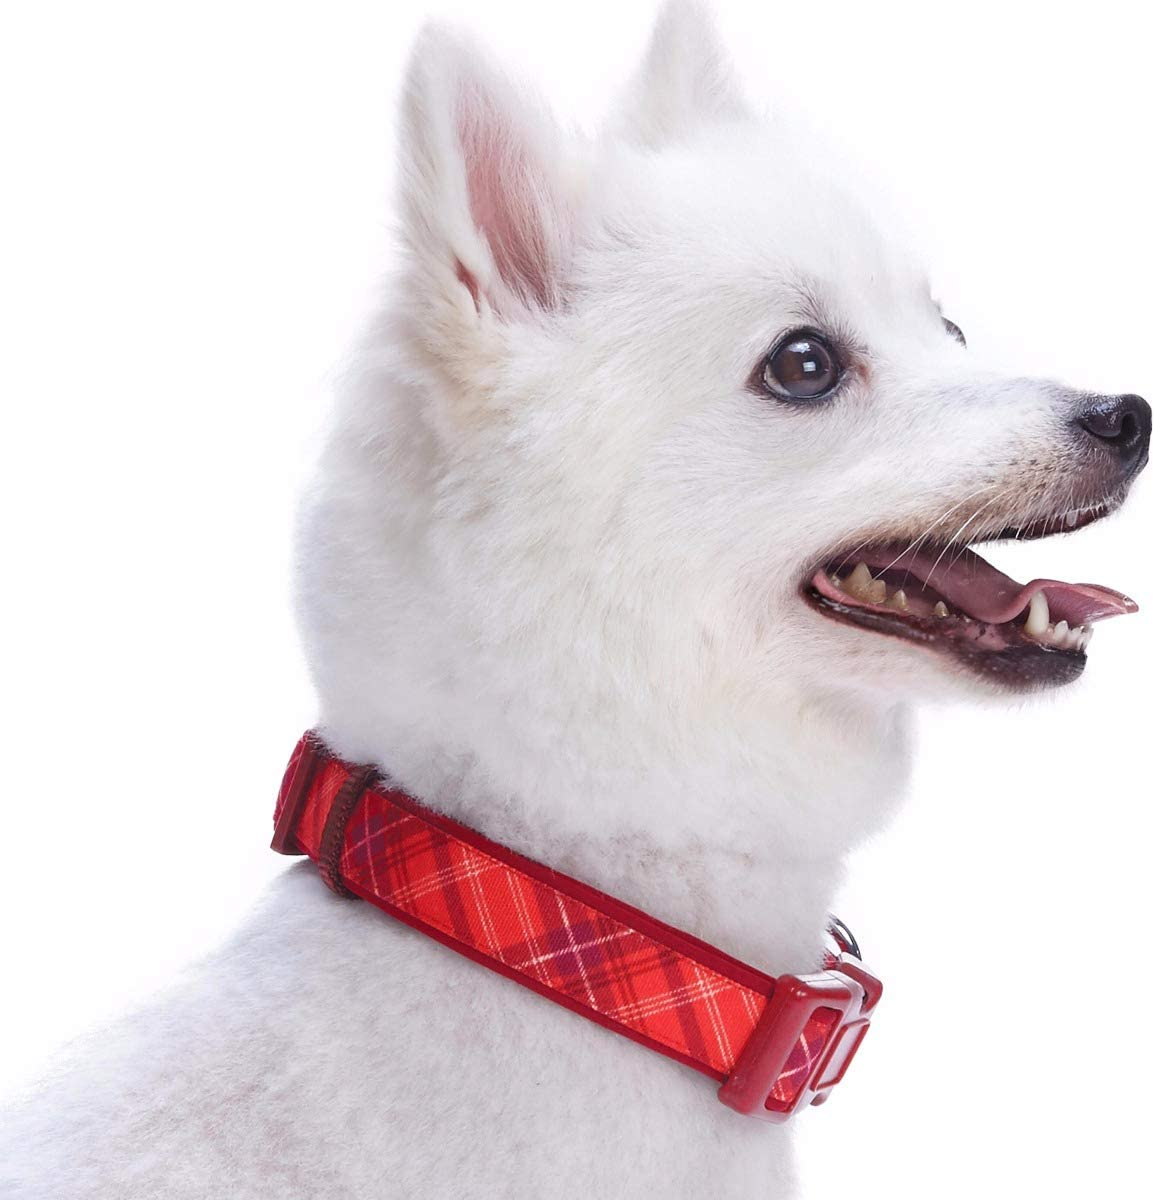 Blueberry Pet Blue Hue Scottish Plaid Style Tie Dog Collar Adjustable Collars for Dogs Neck 14.5-20 Medium